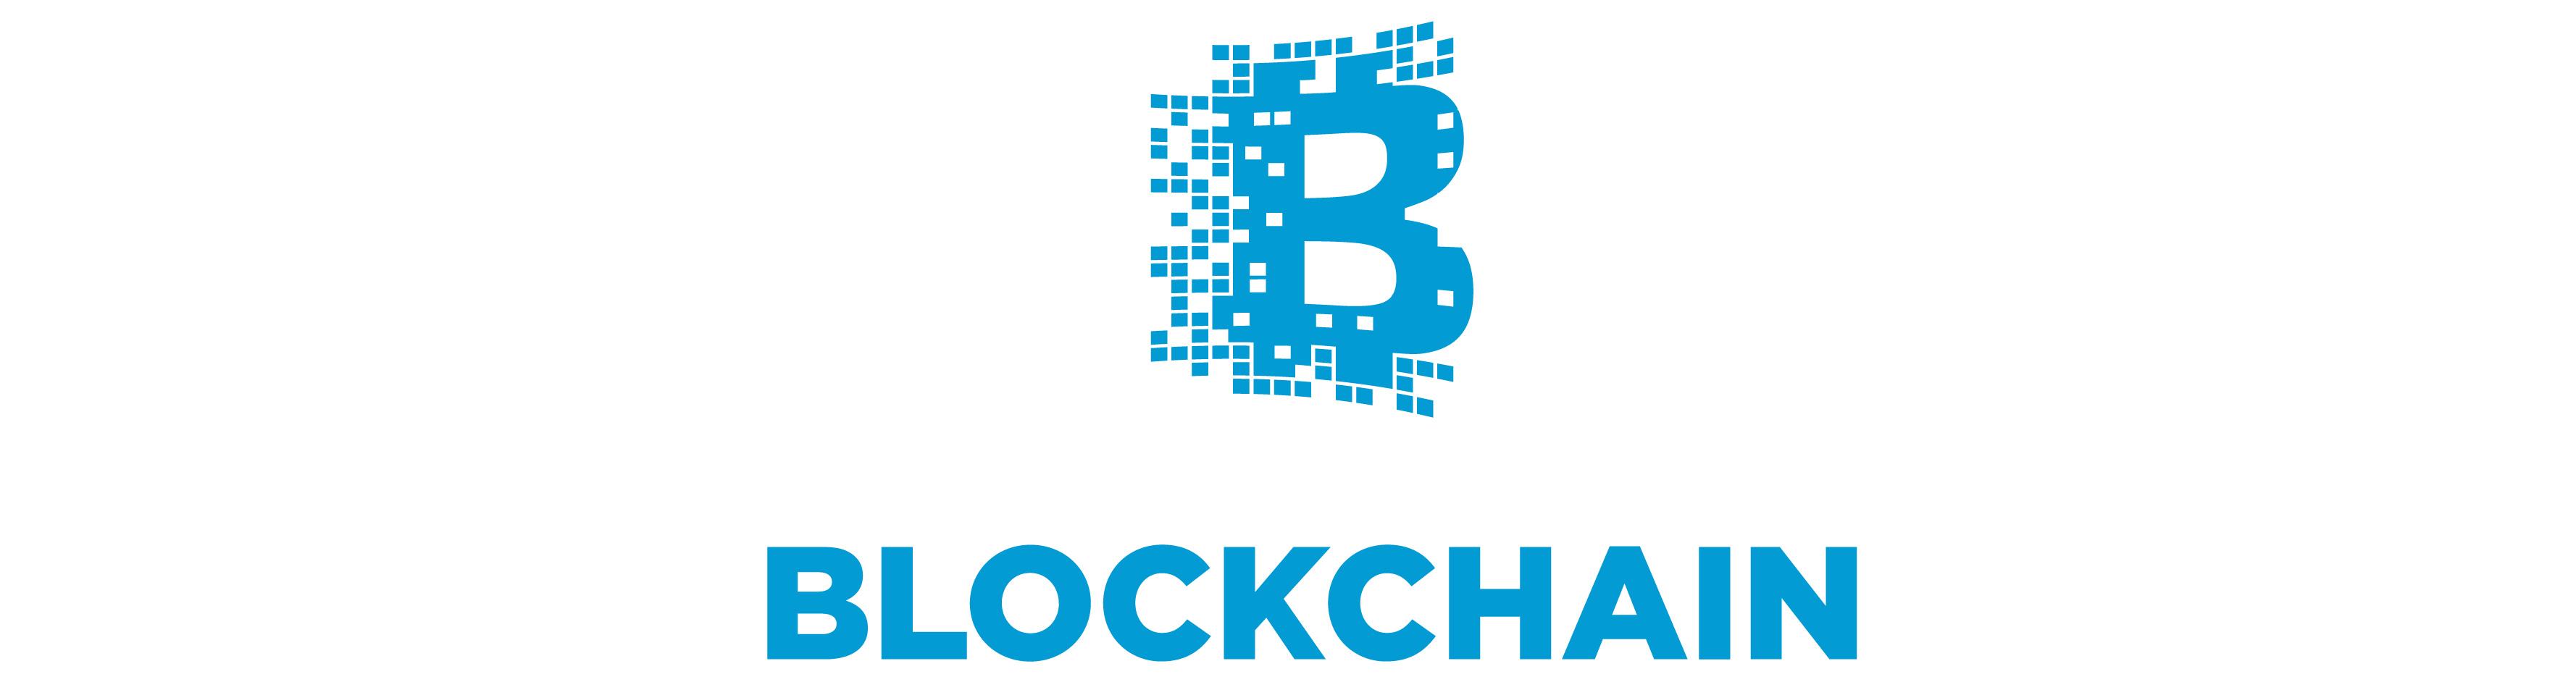 ulyces-blockchainsummit-08